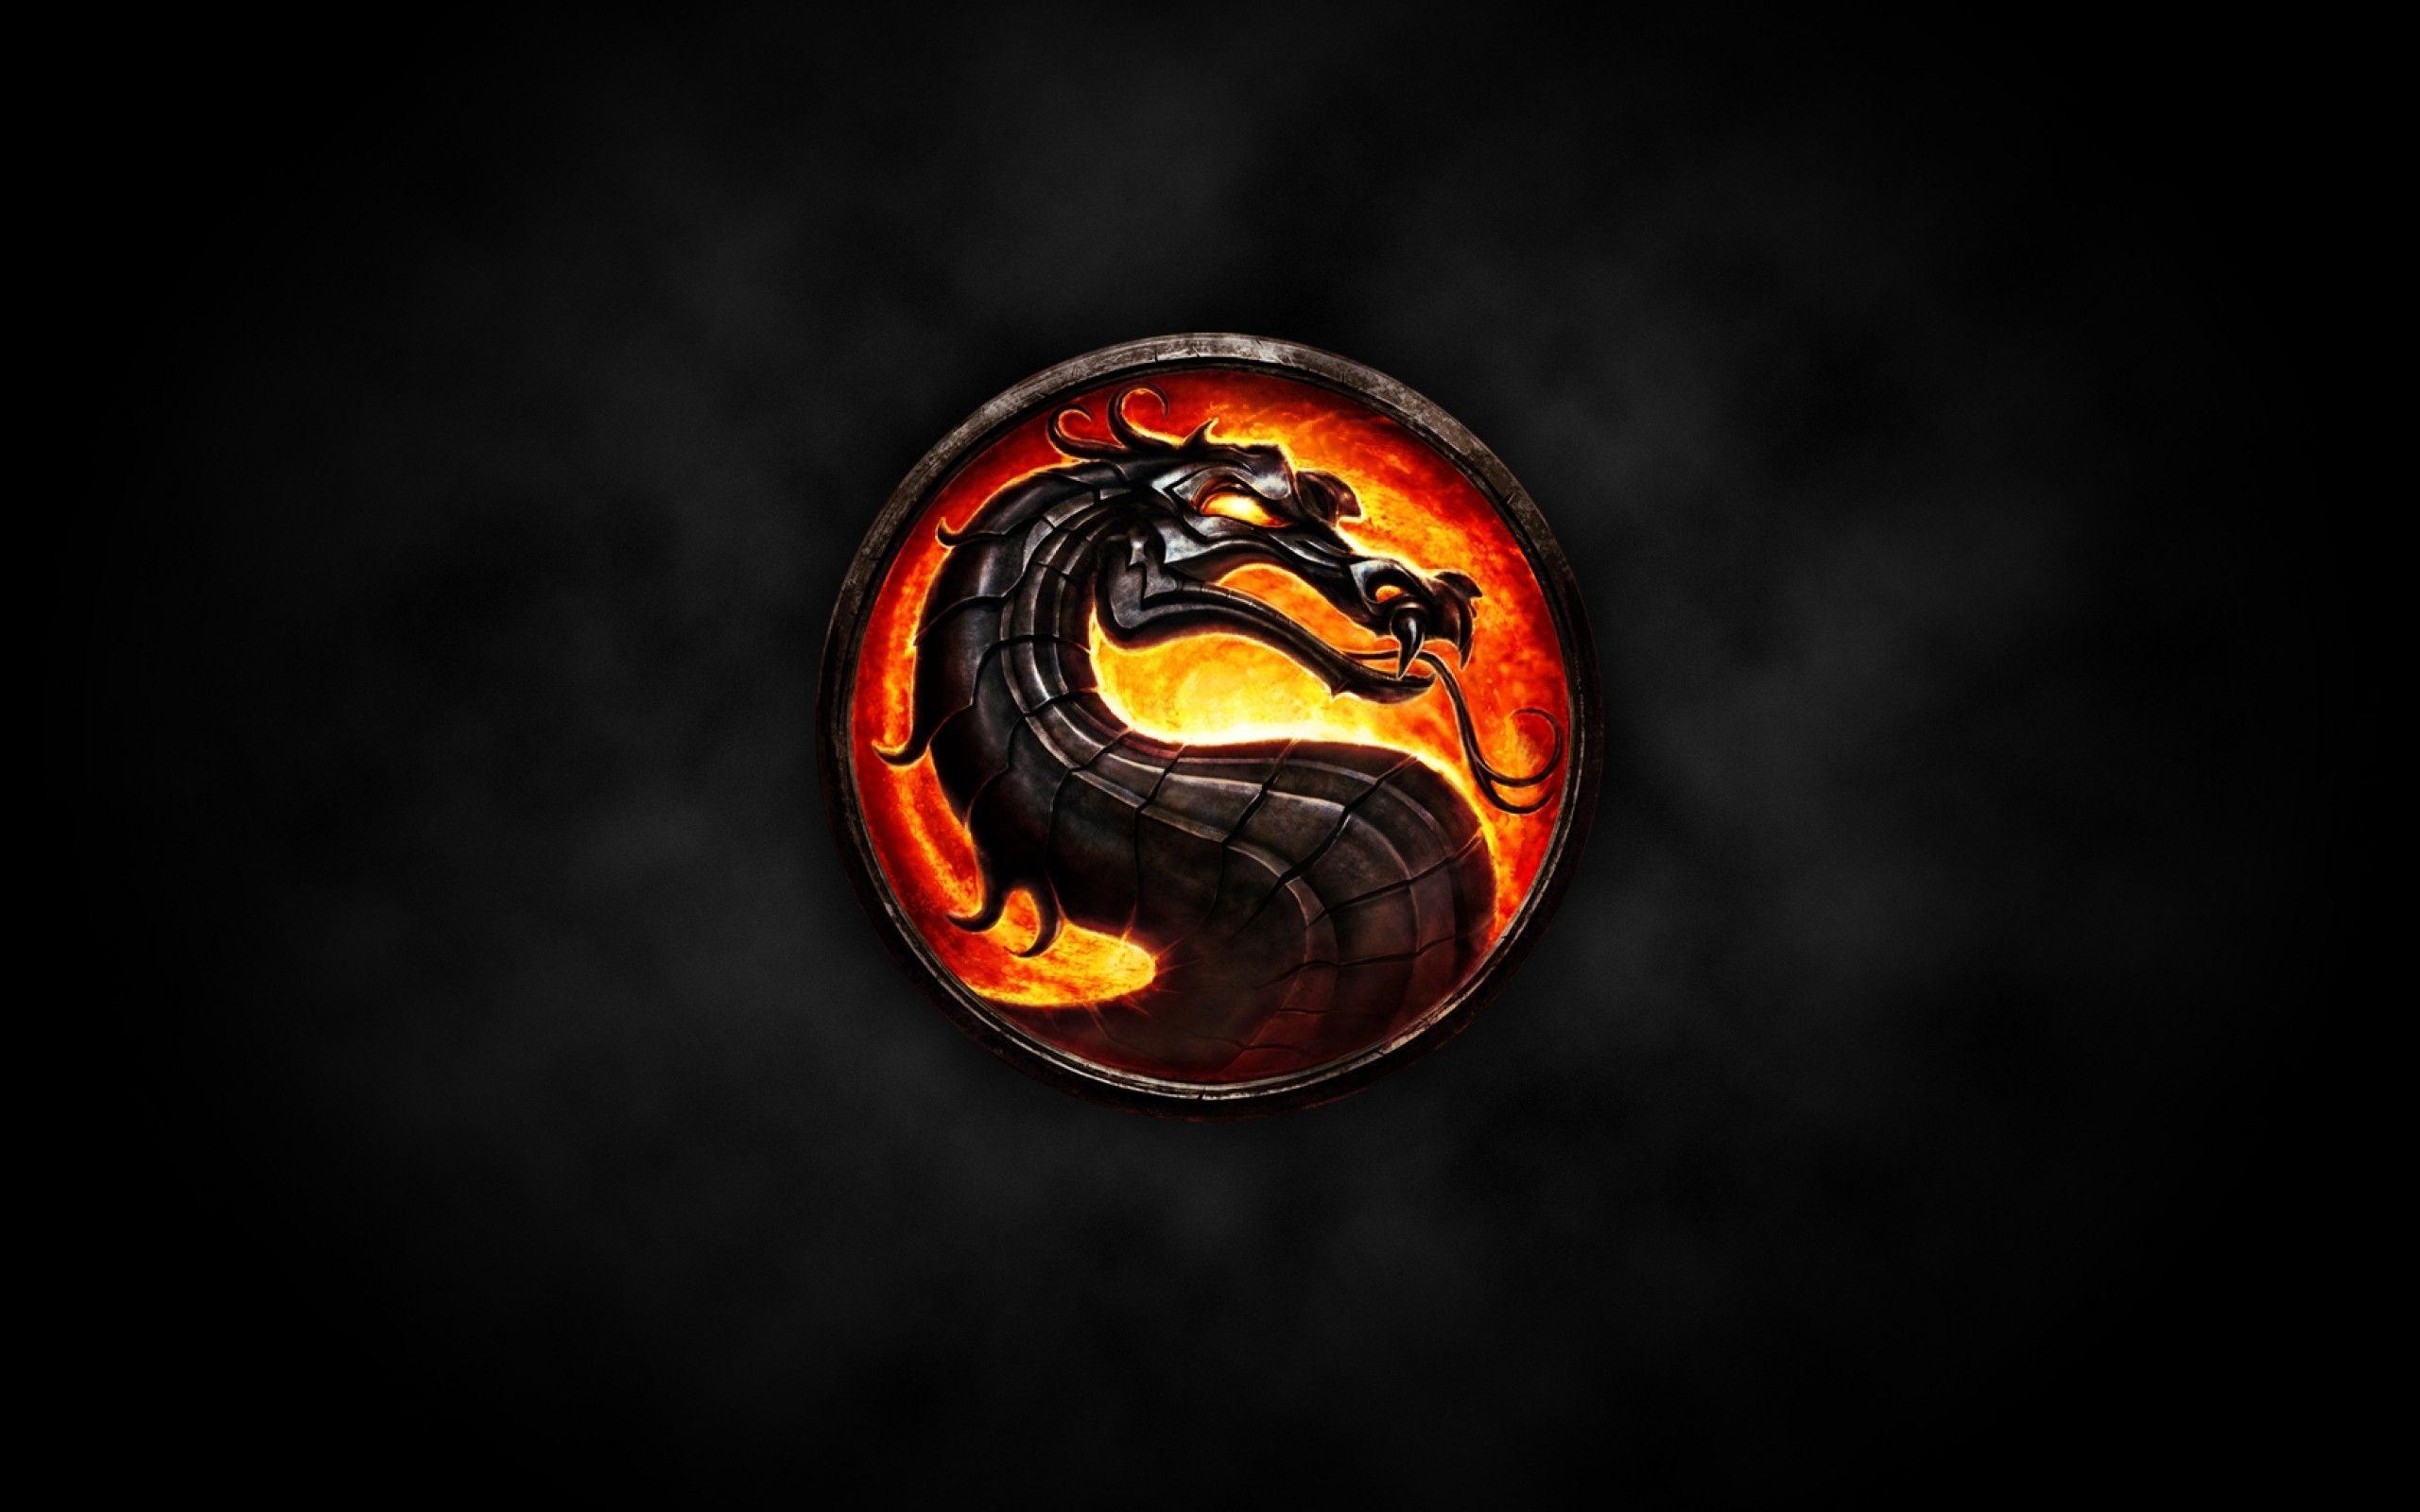 Dragon Logo Wallpapers - Wallpaper Cave